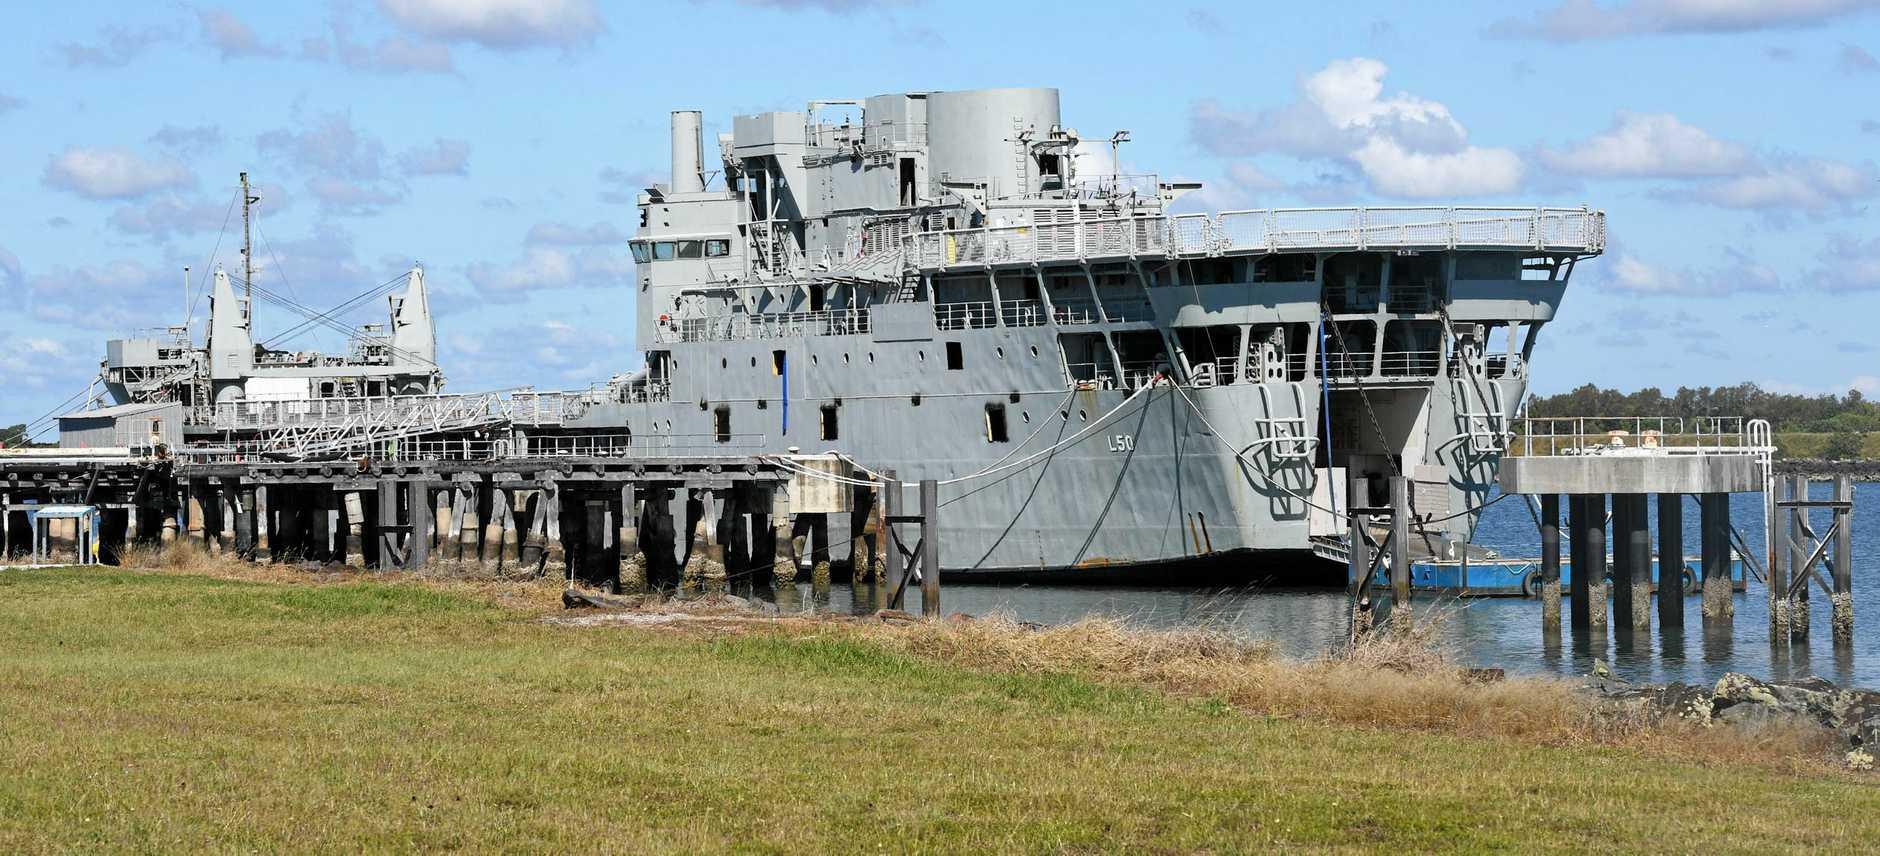 Ex-HMAS Tobruk in the Bundaberg Port.